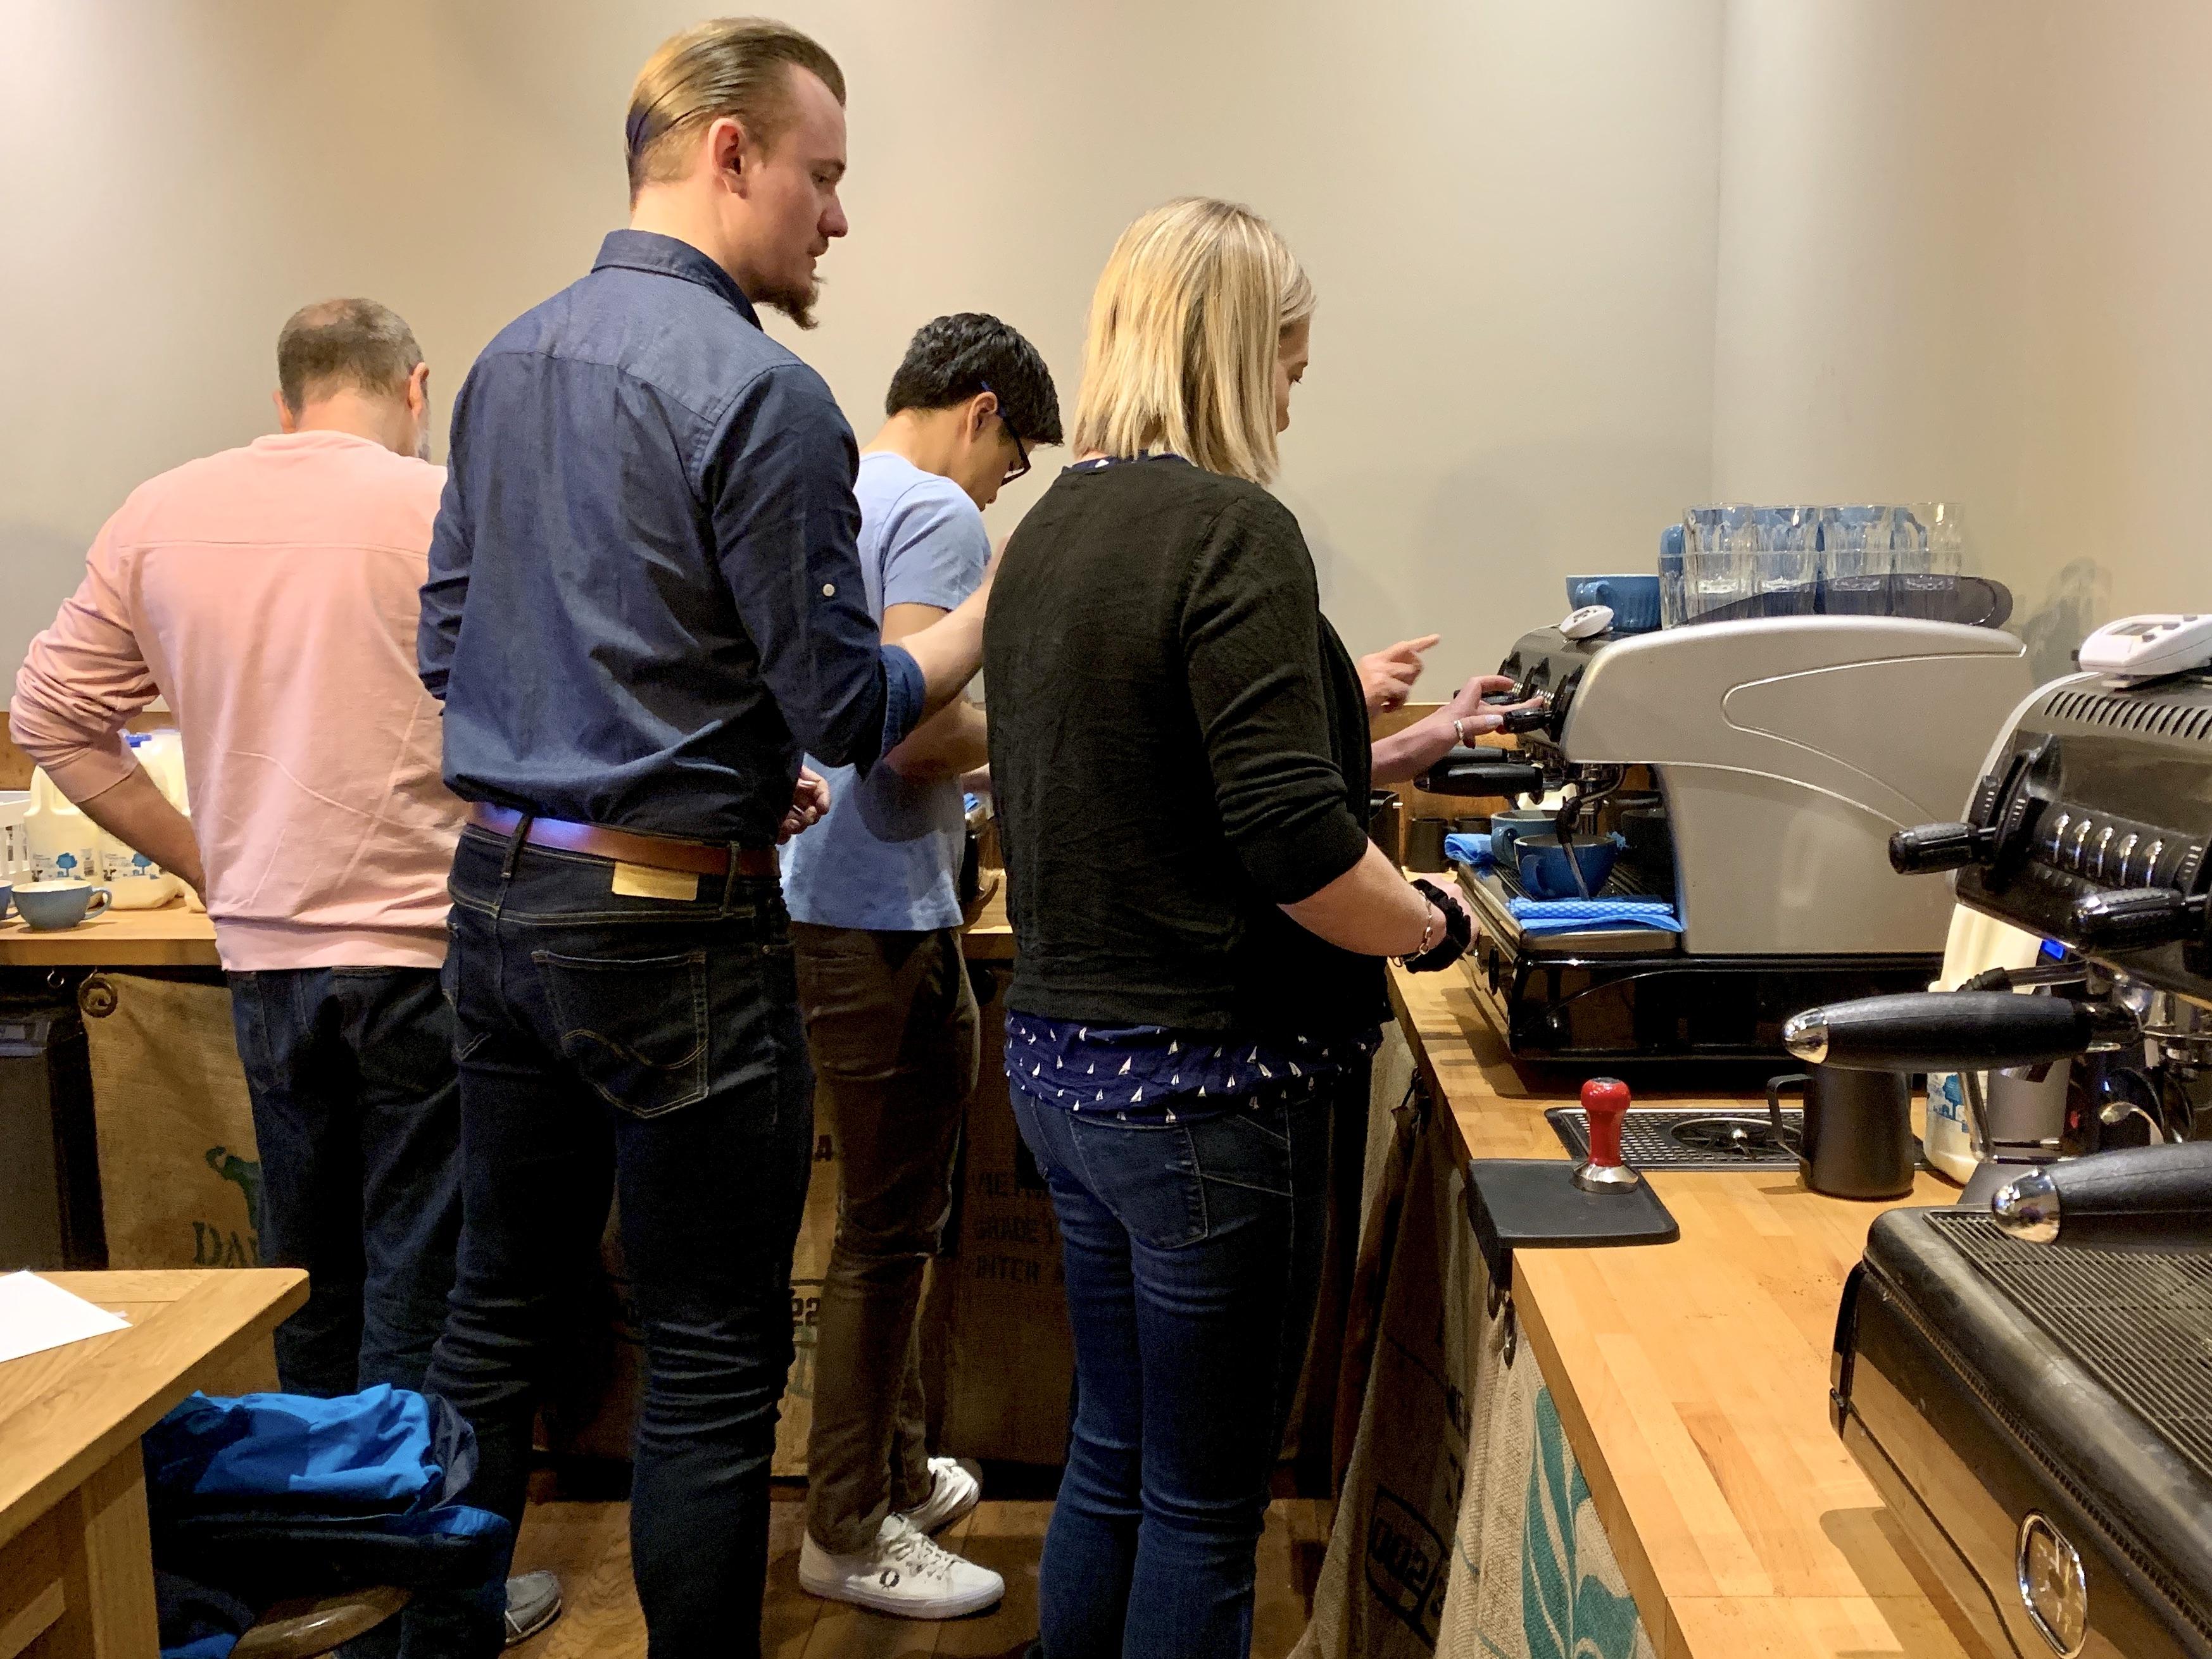 Barista school in progress - people learning to make coffee